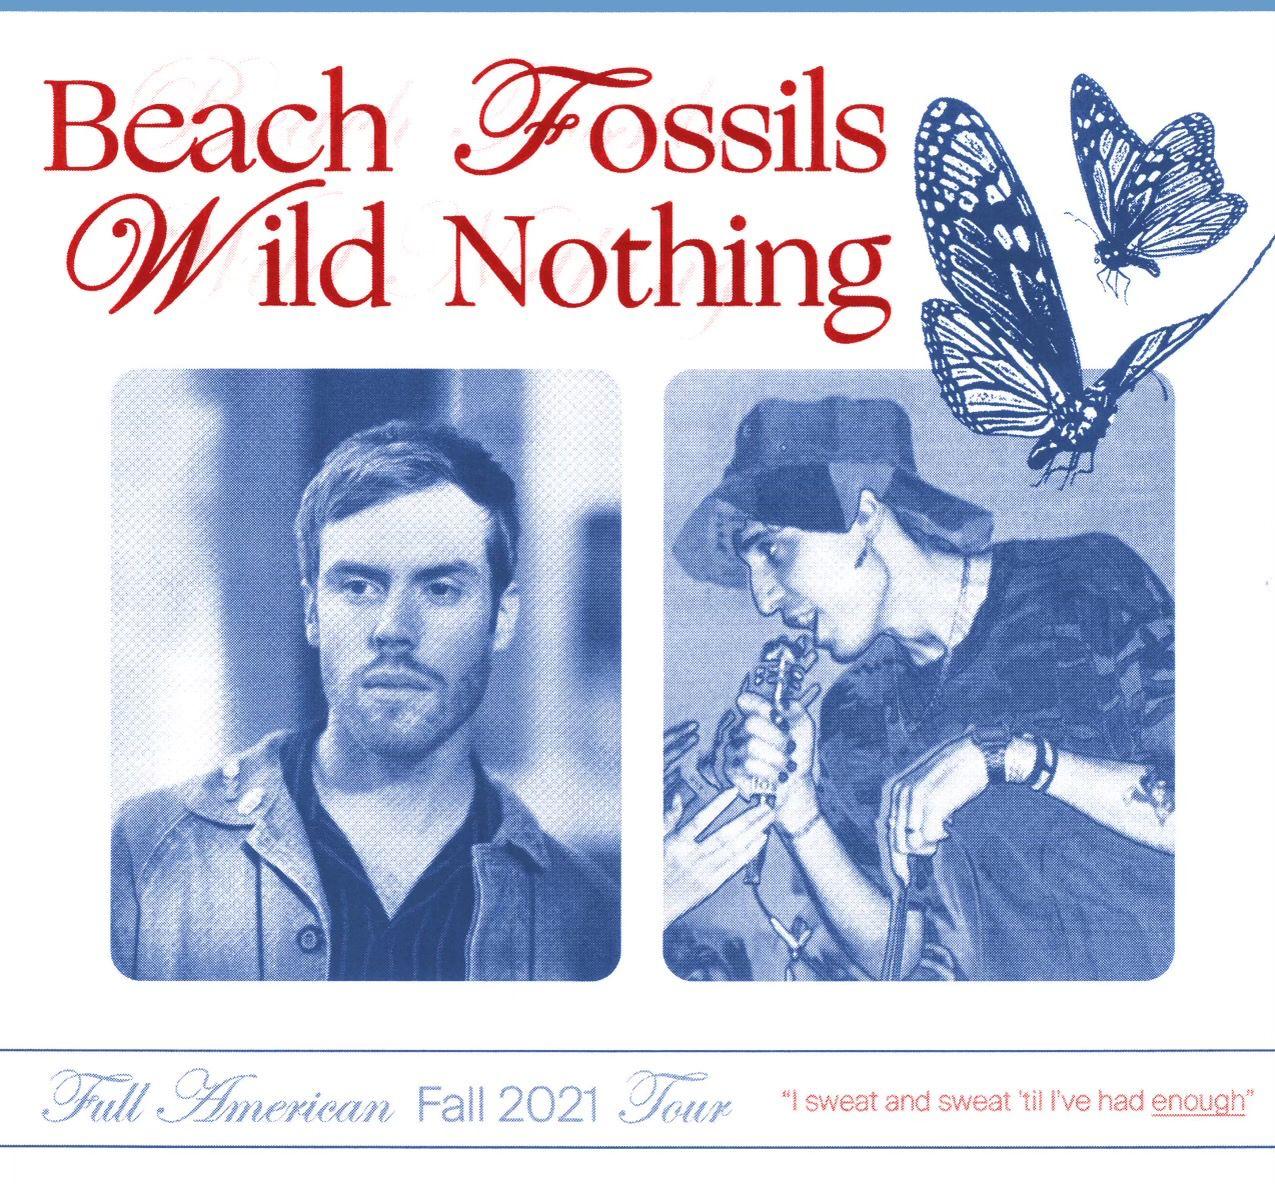 Beach Fossils + Wild Nothing